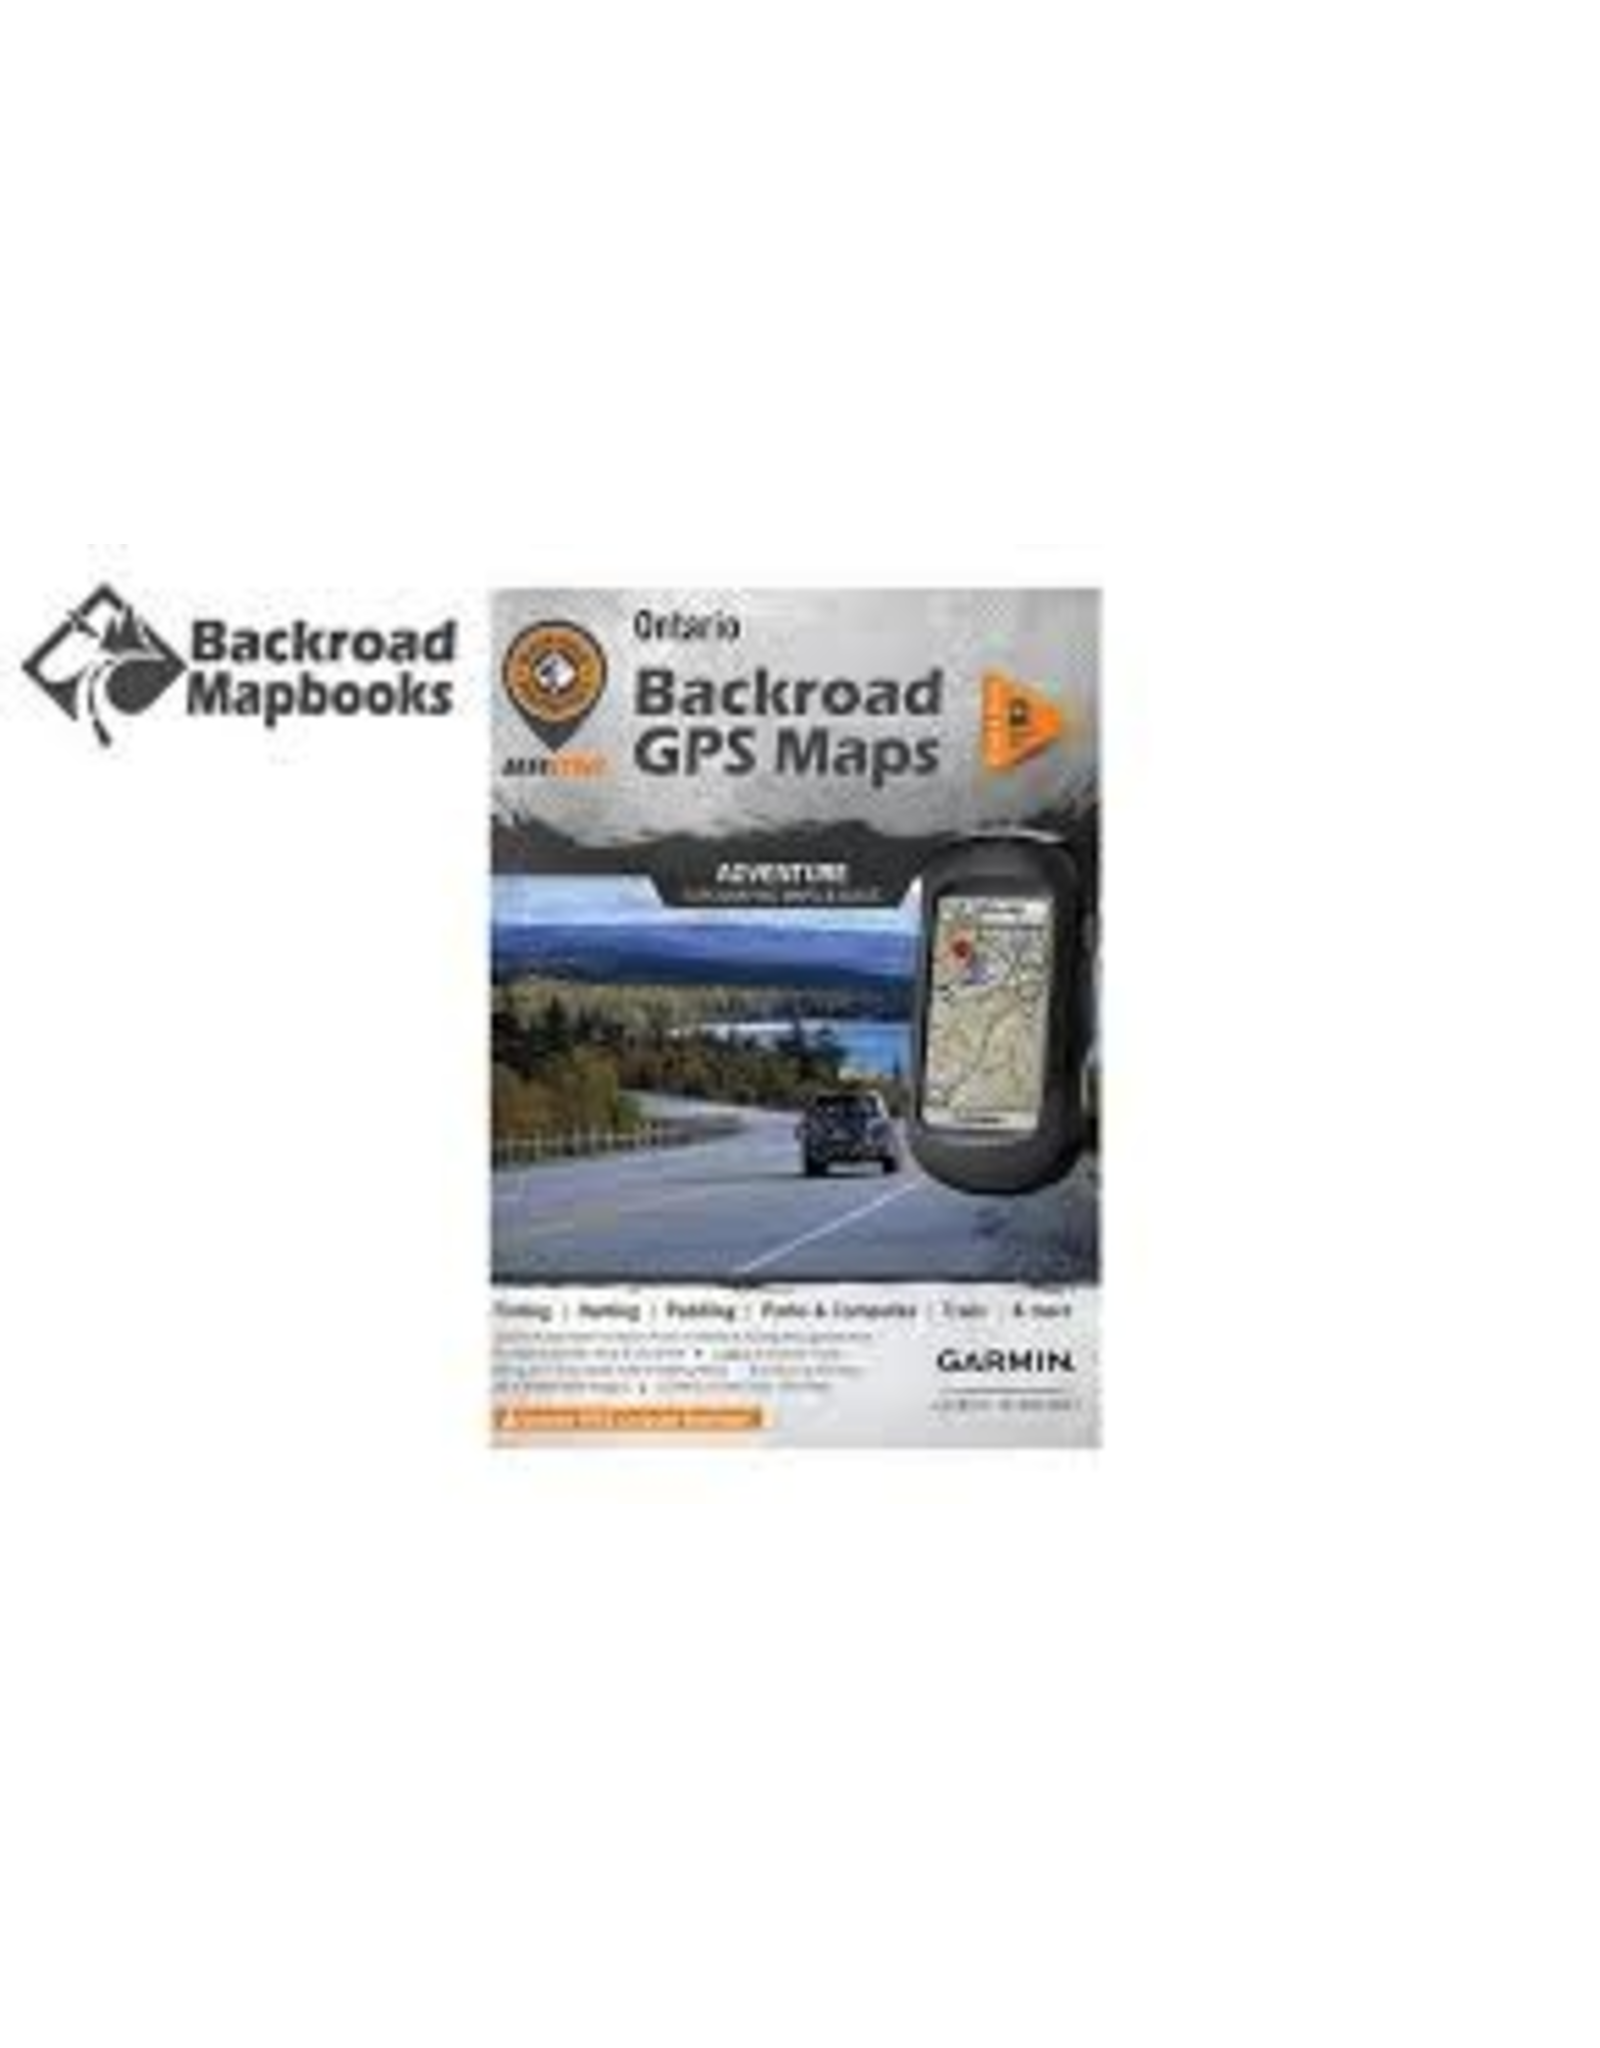 Backroad Mapbooks Backroad Mapbooks  ONONSD Ontario GPS  Maps SD